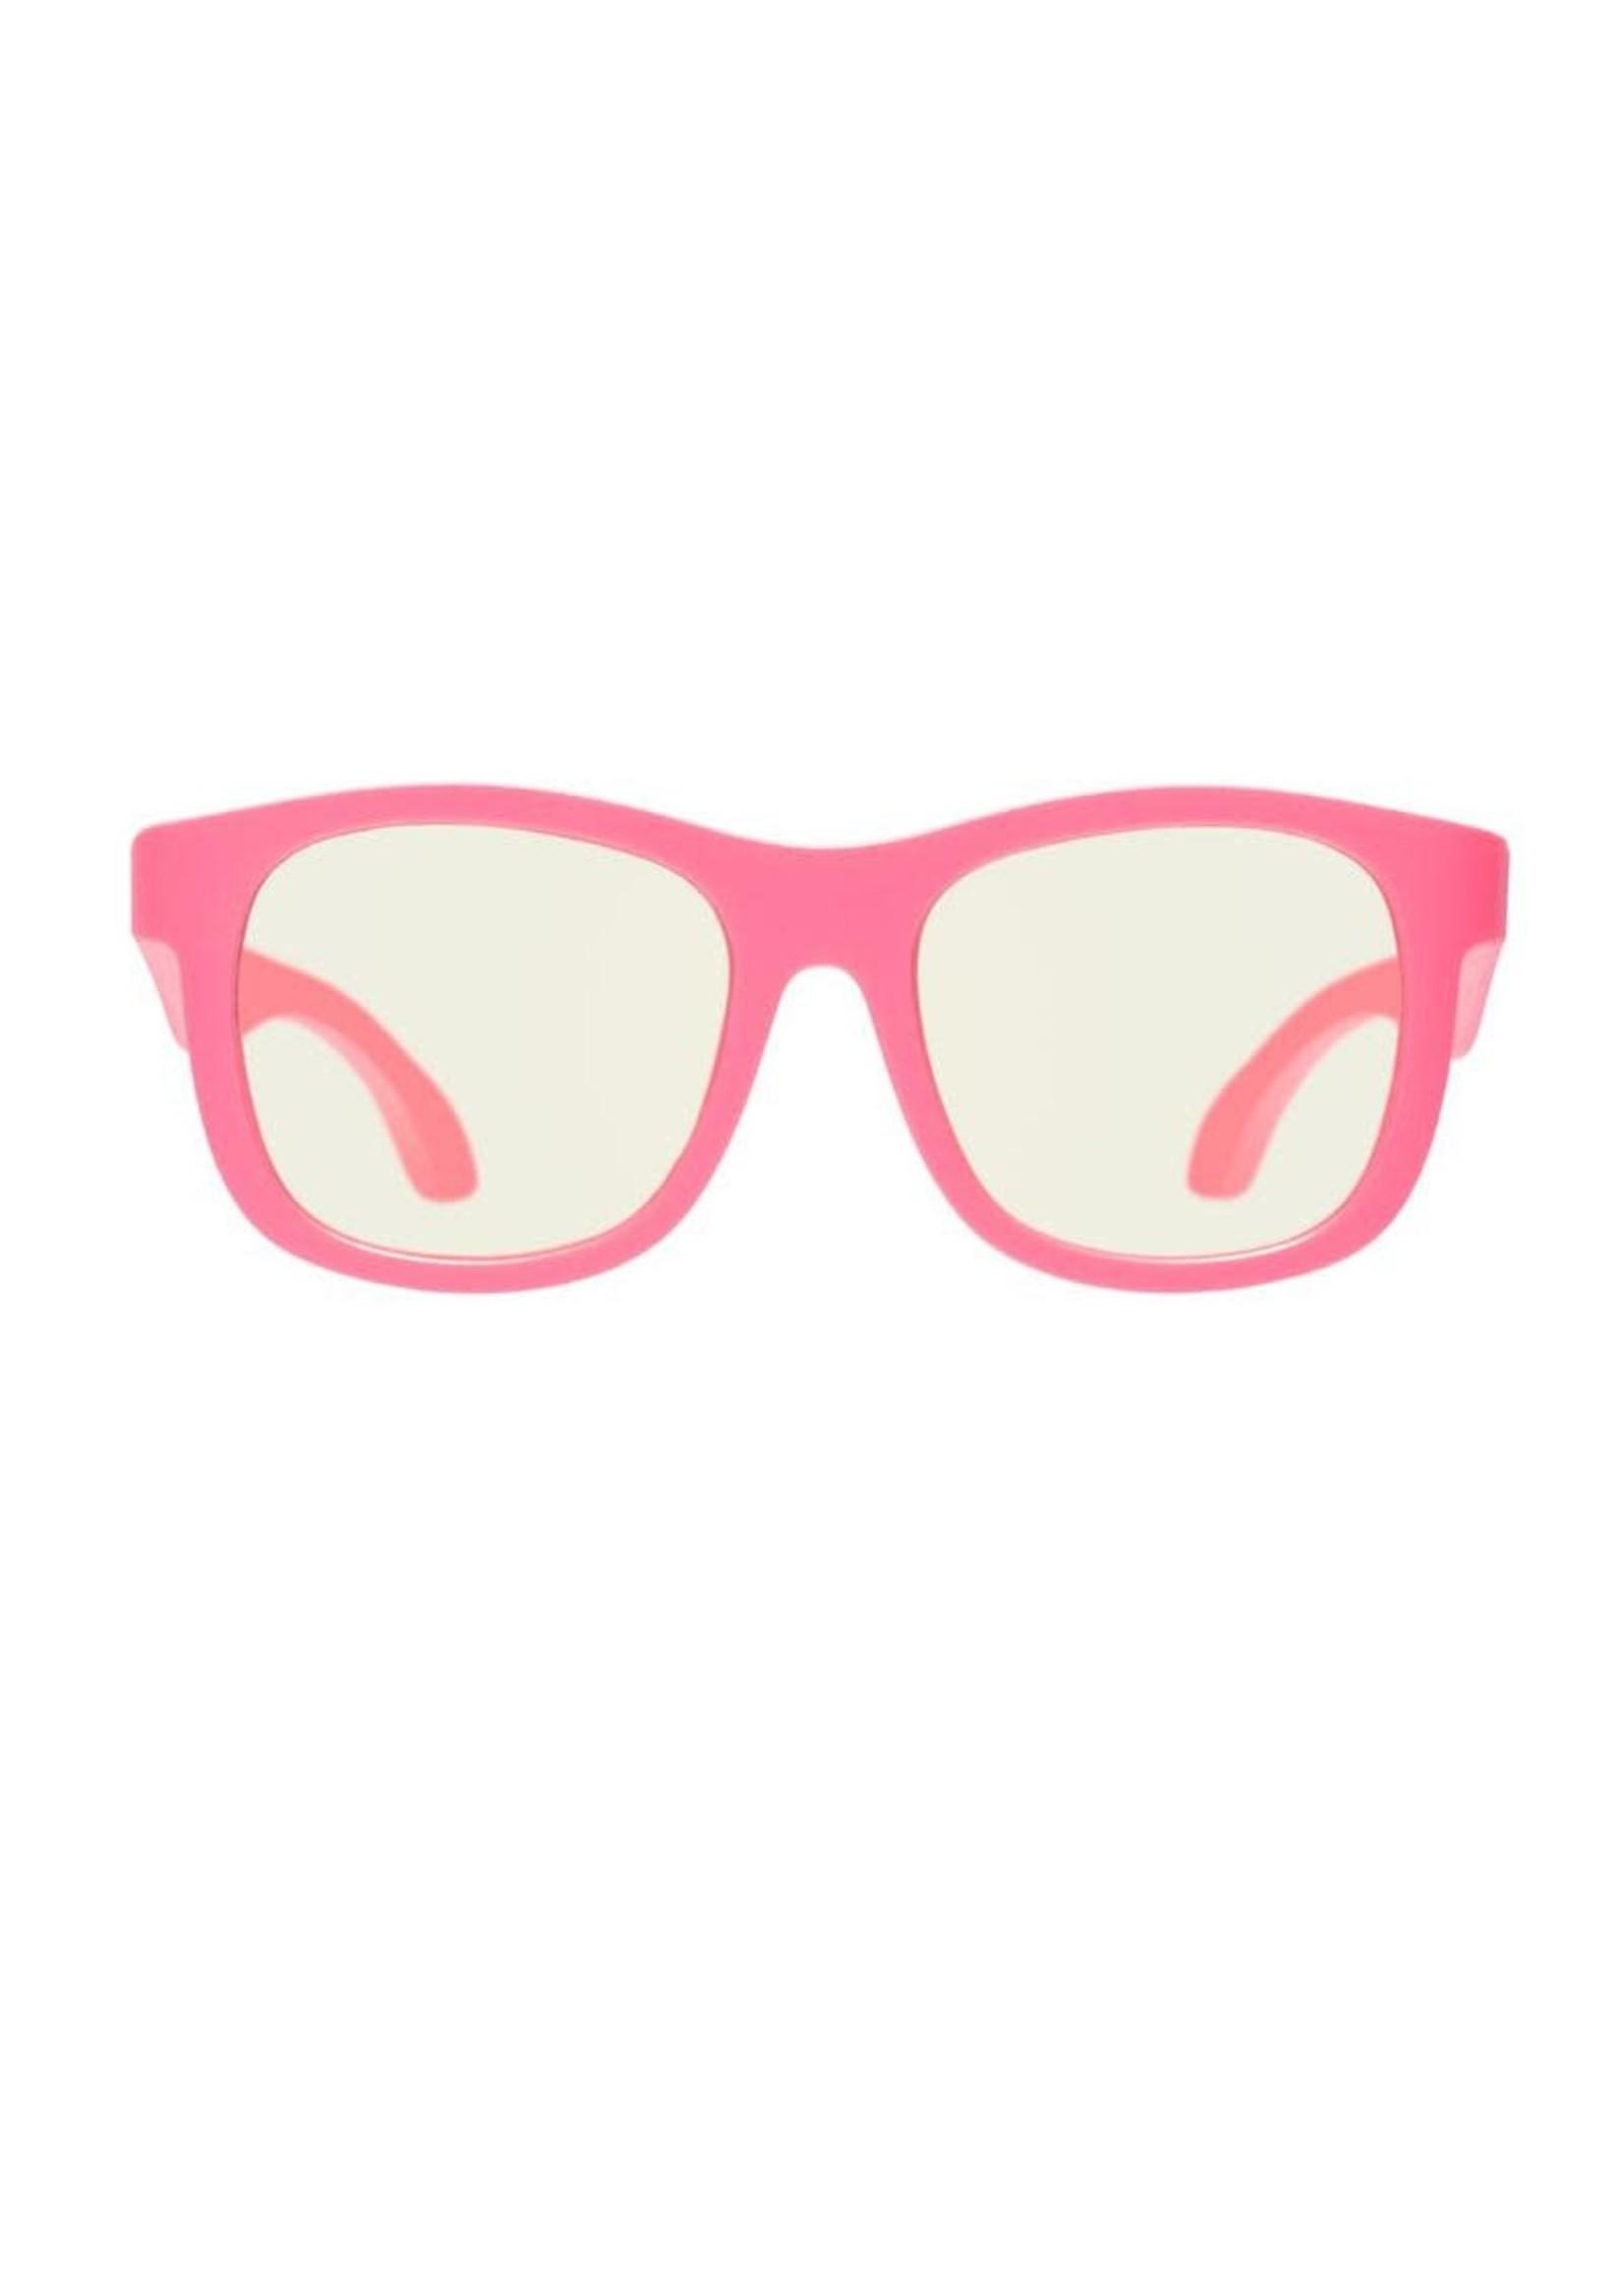 Babiators Babiators, Navigator Screen Saver Glasses